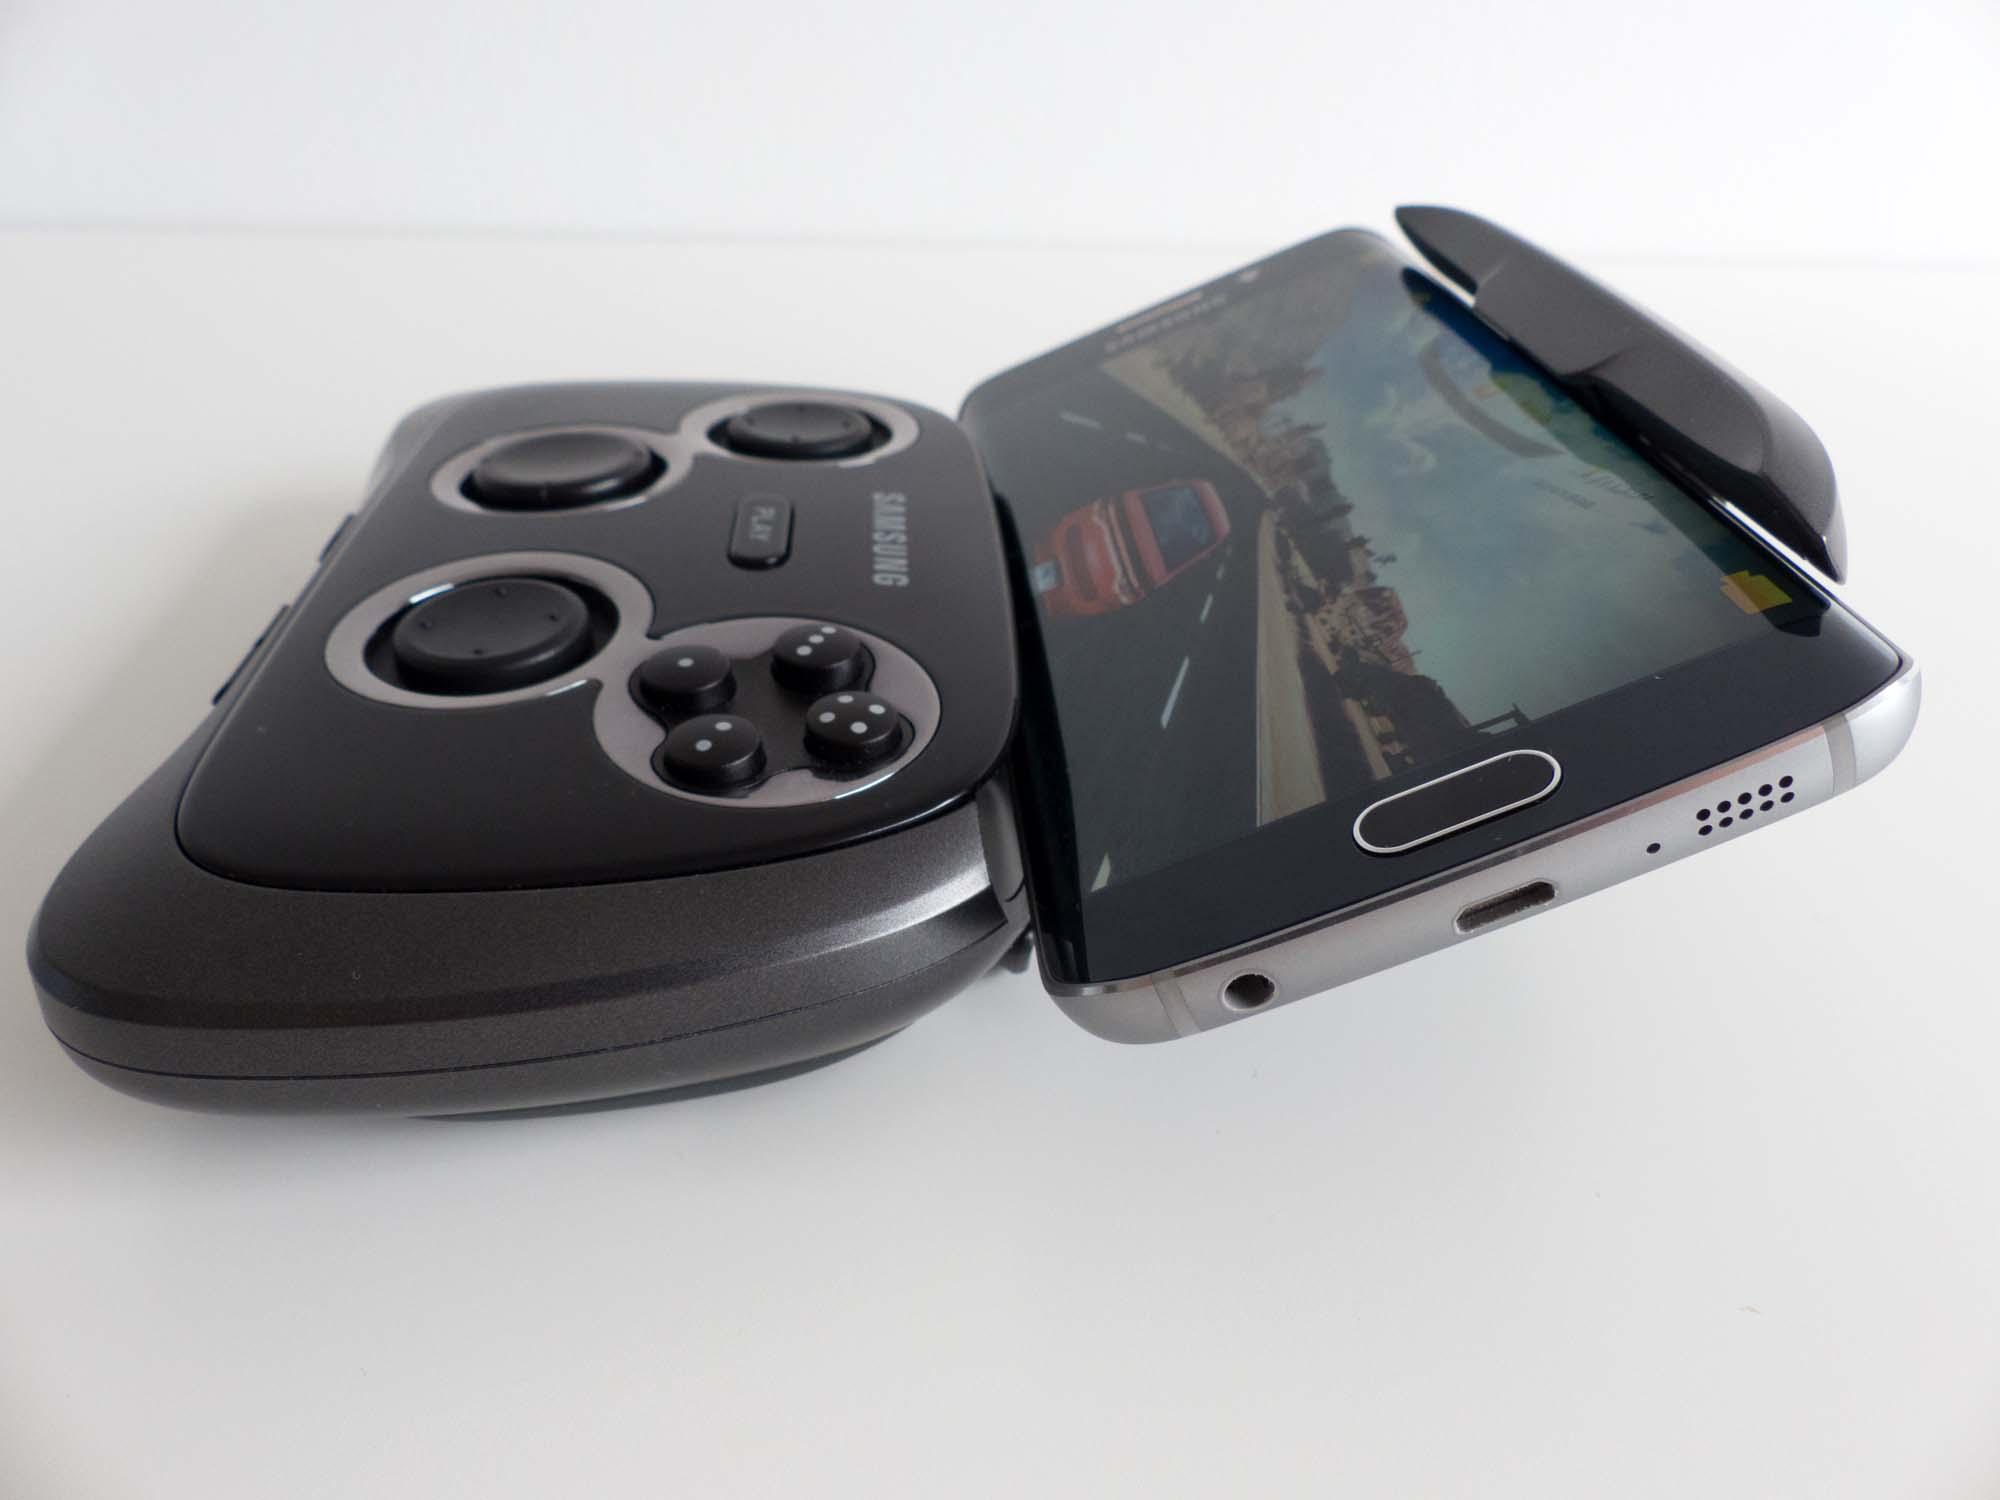 Galeria Zdjęć: Samsung Galaxy S6 Edge, Samsung Game Pad